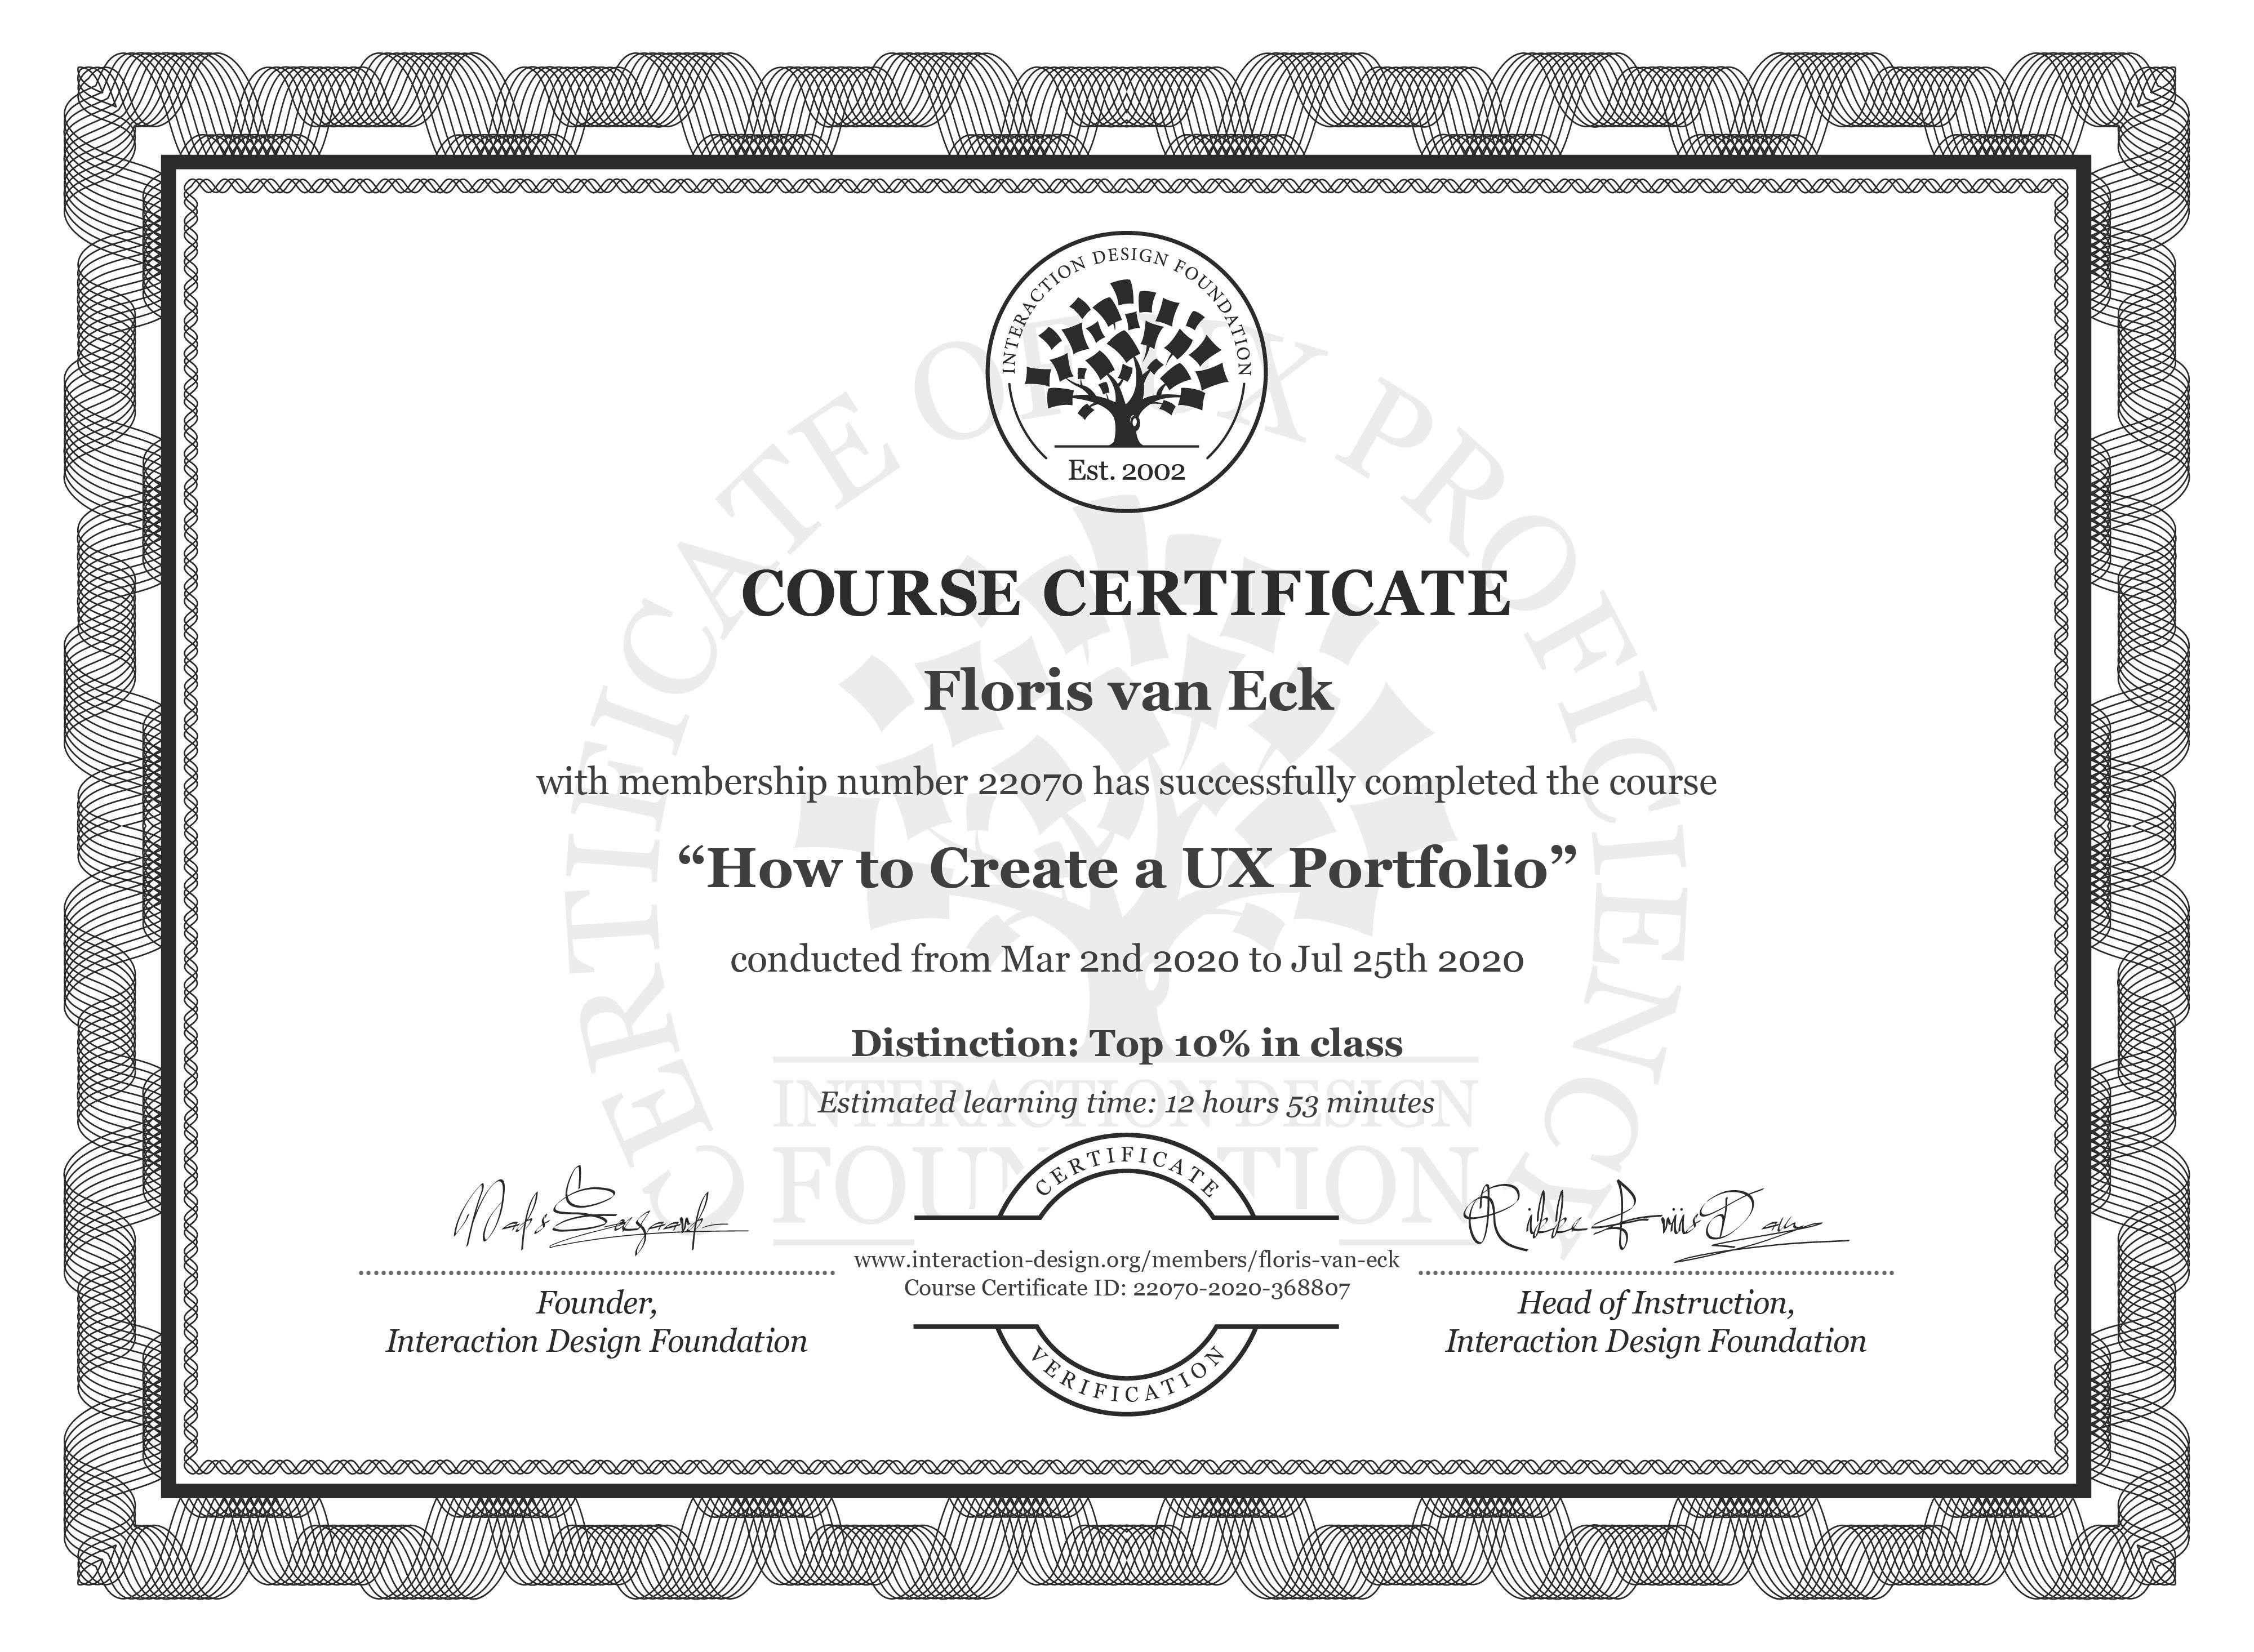 Floris van Eck's Course Certificate: How to Create a UX Portfolio